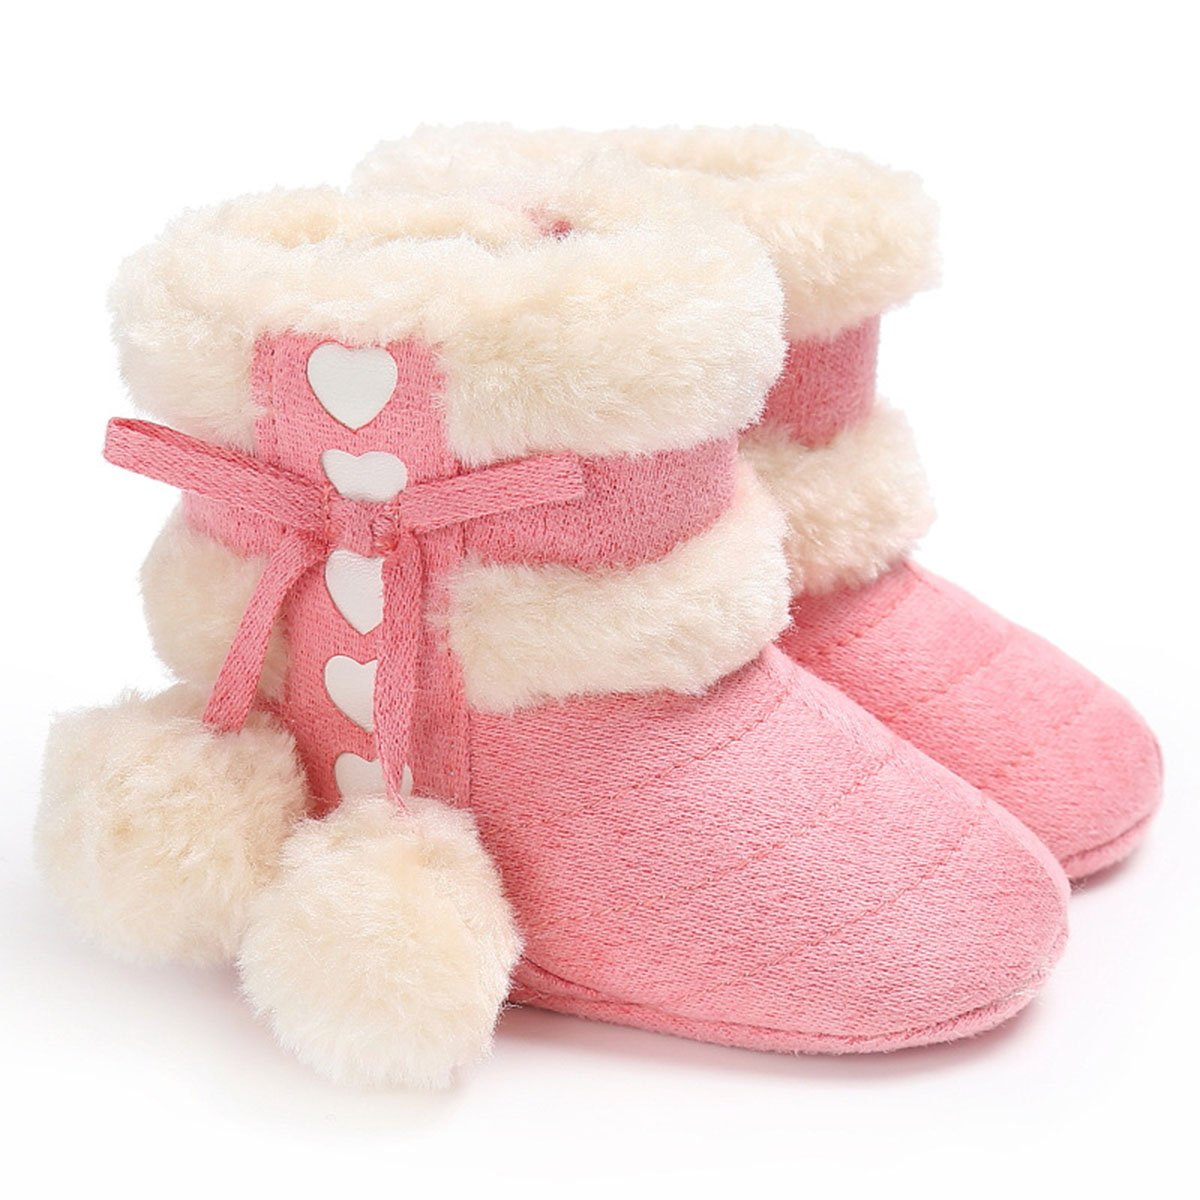 Butterme Baby Caliente Botas De Algodón Suave Antideslizante Soles Lindo Zapatos De Niño Para 0-18 Meses Bebé(11CM, Beige) ZUMUii ZUMU00005113